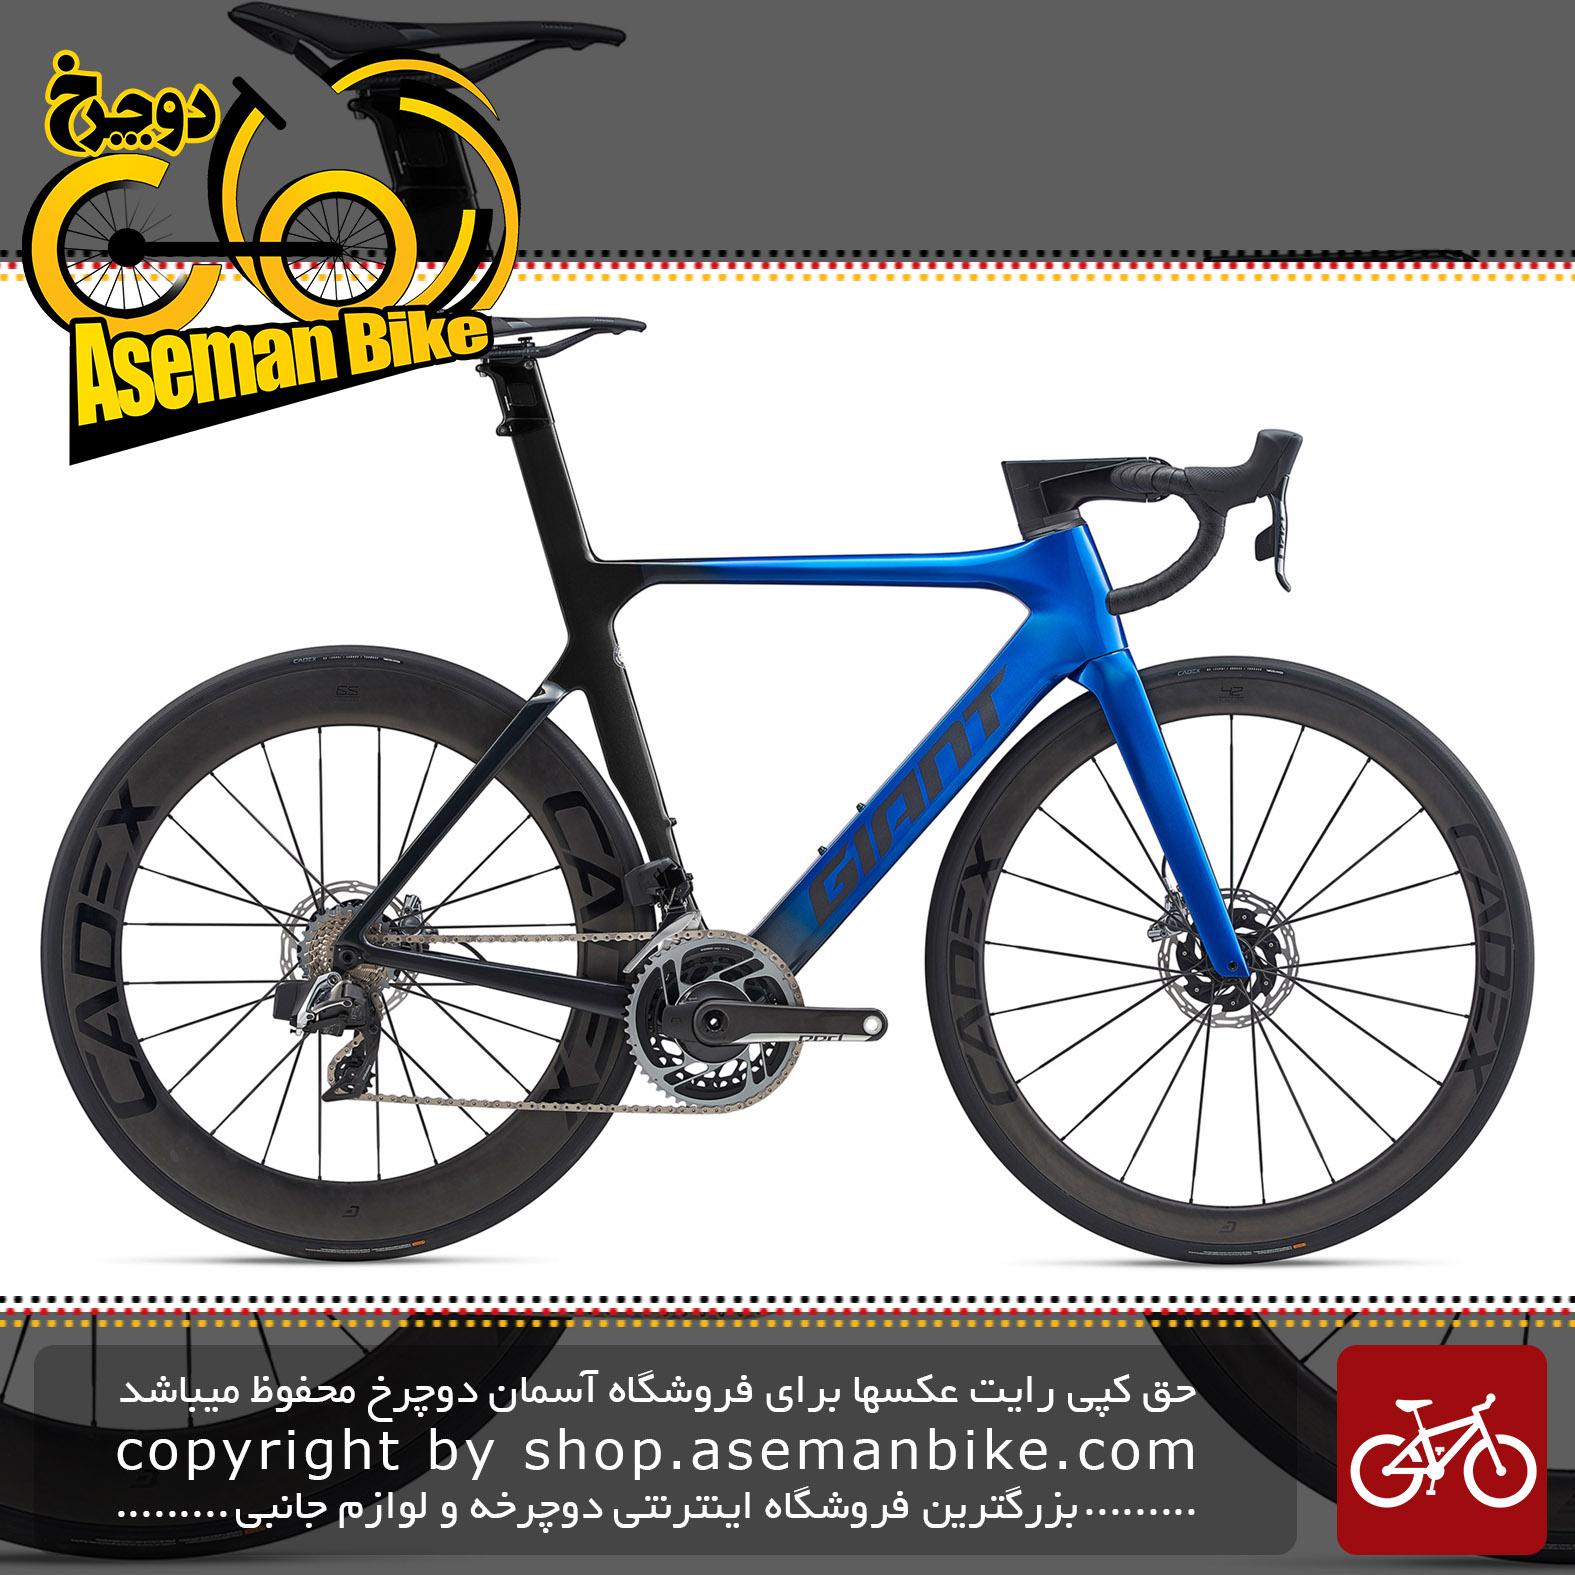 دوچرخه جاده جاینت مدل پروپل ادونس اس ال زیرو دیسک هیدرولیک Giant Bicycle Propel Advanced SL 0 Disc Red